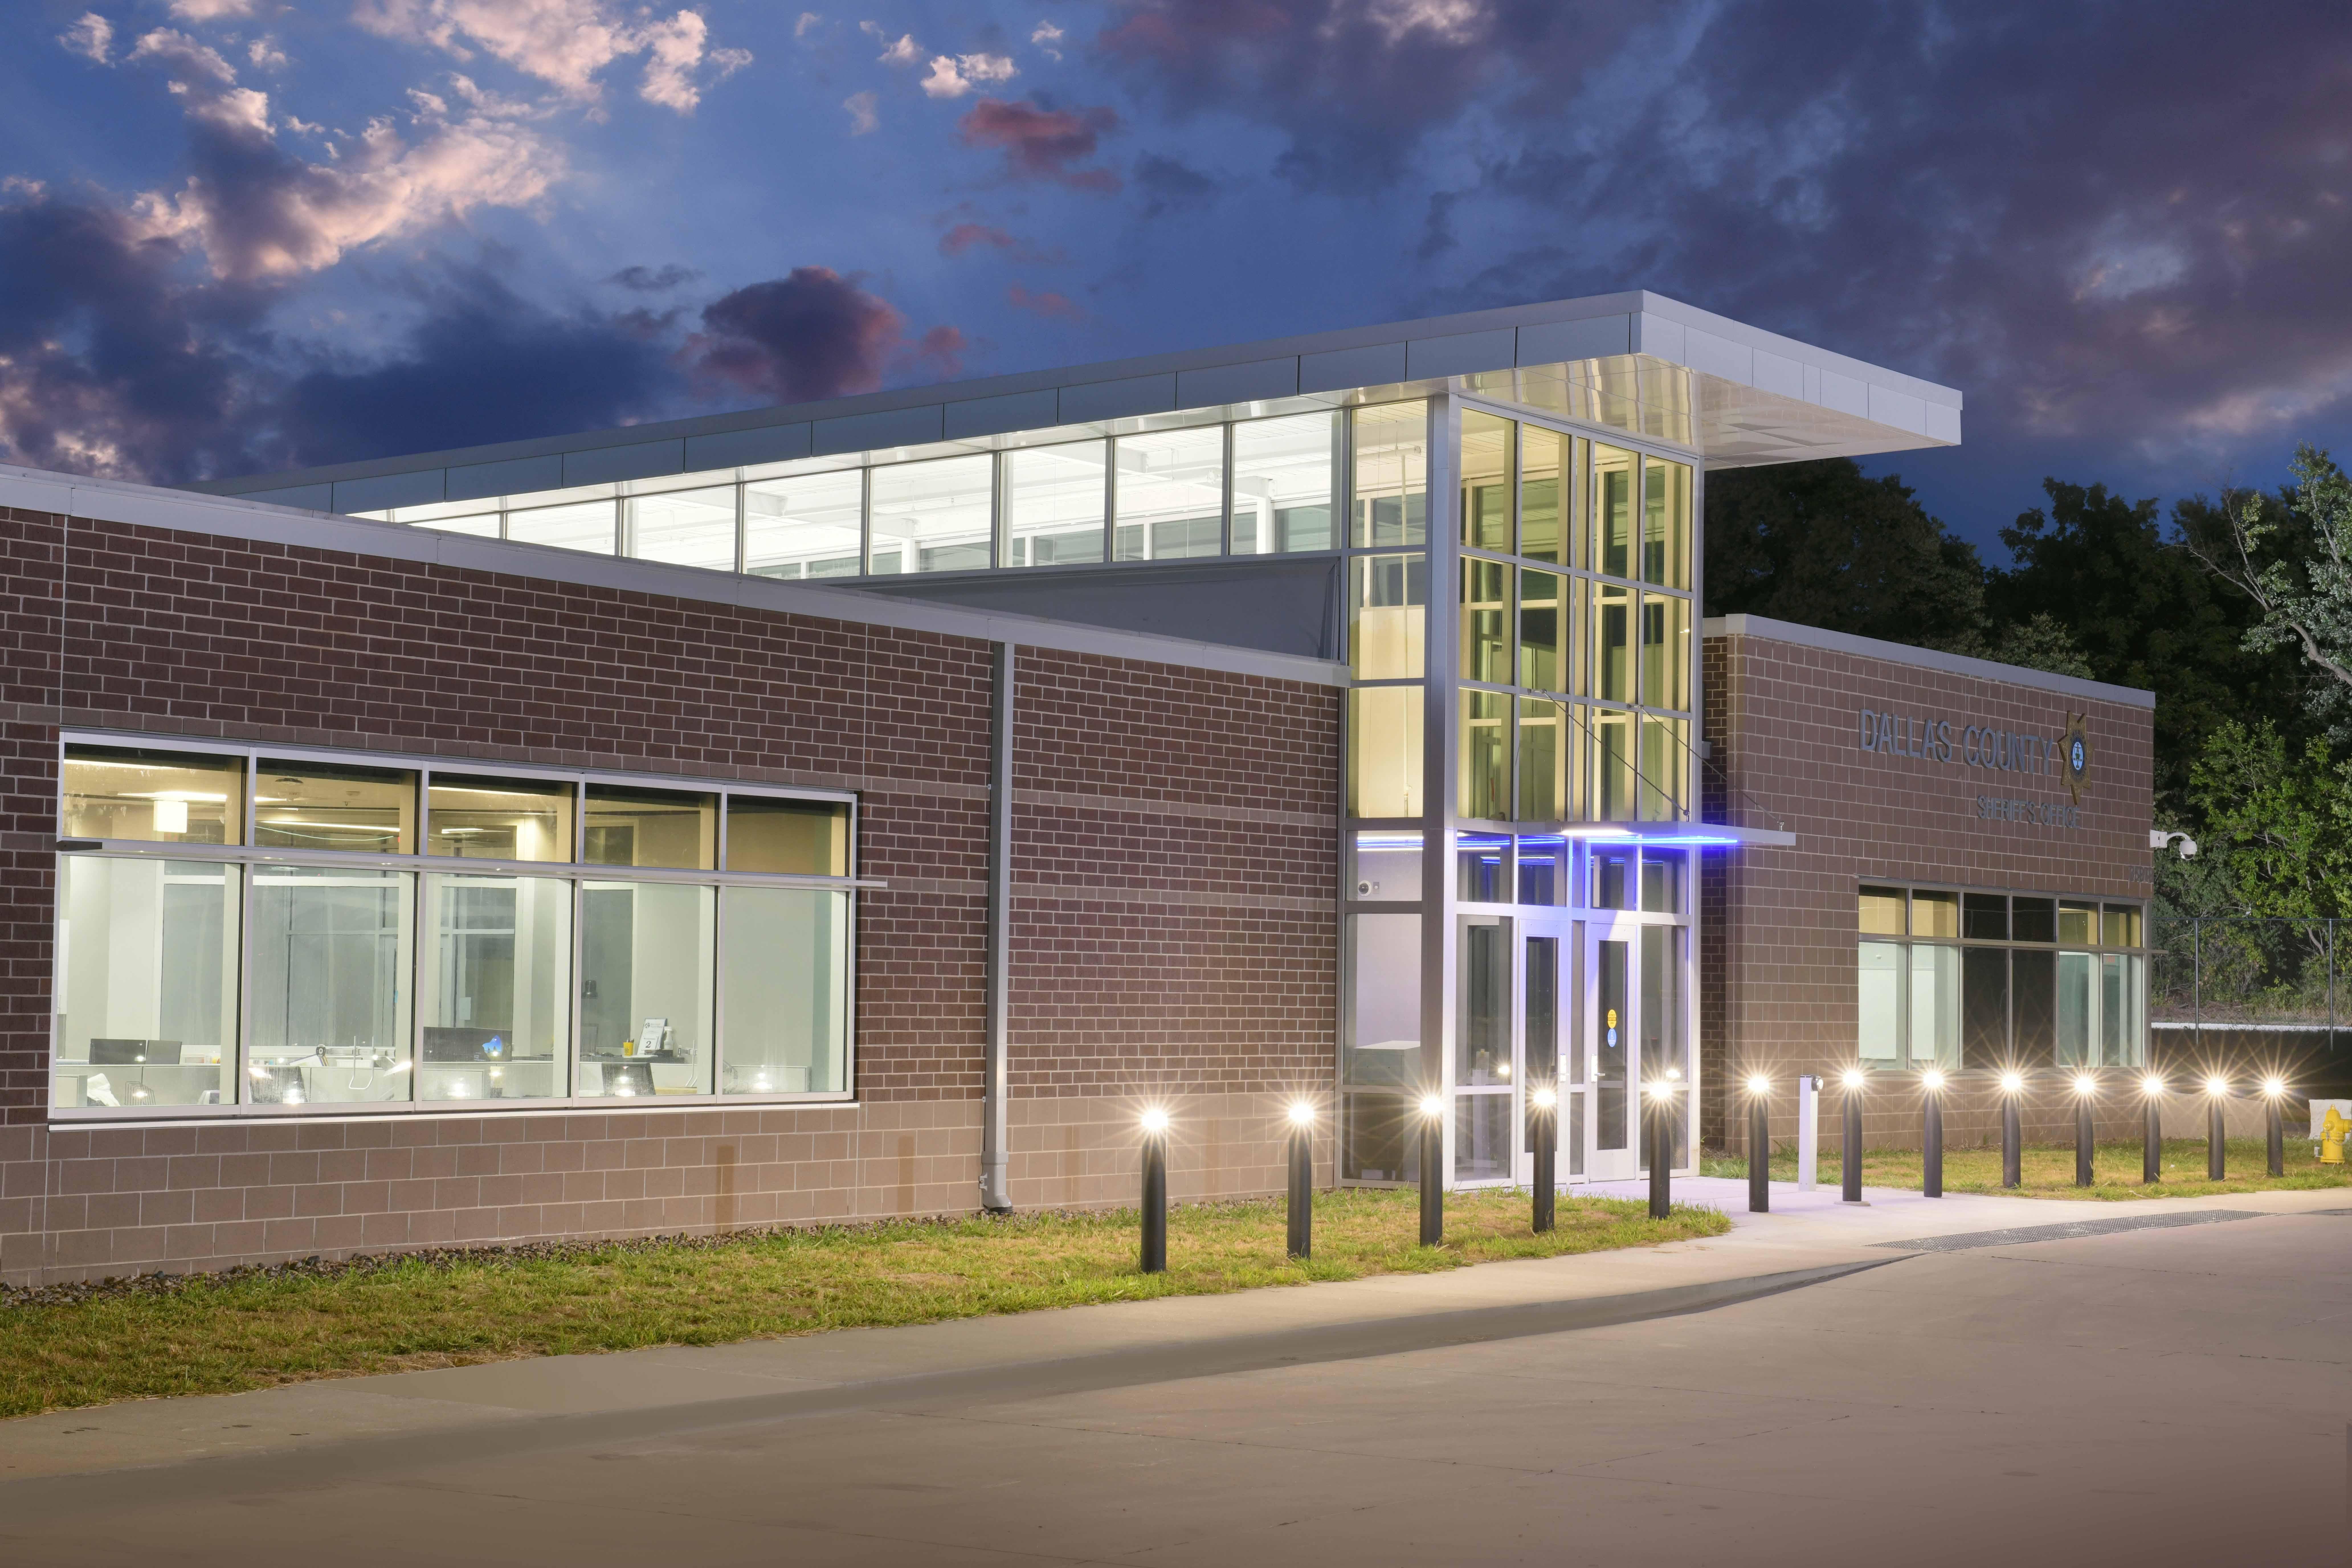 Dallas County Law Enforcement Center Exterior The Samuels Group